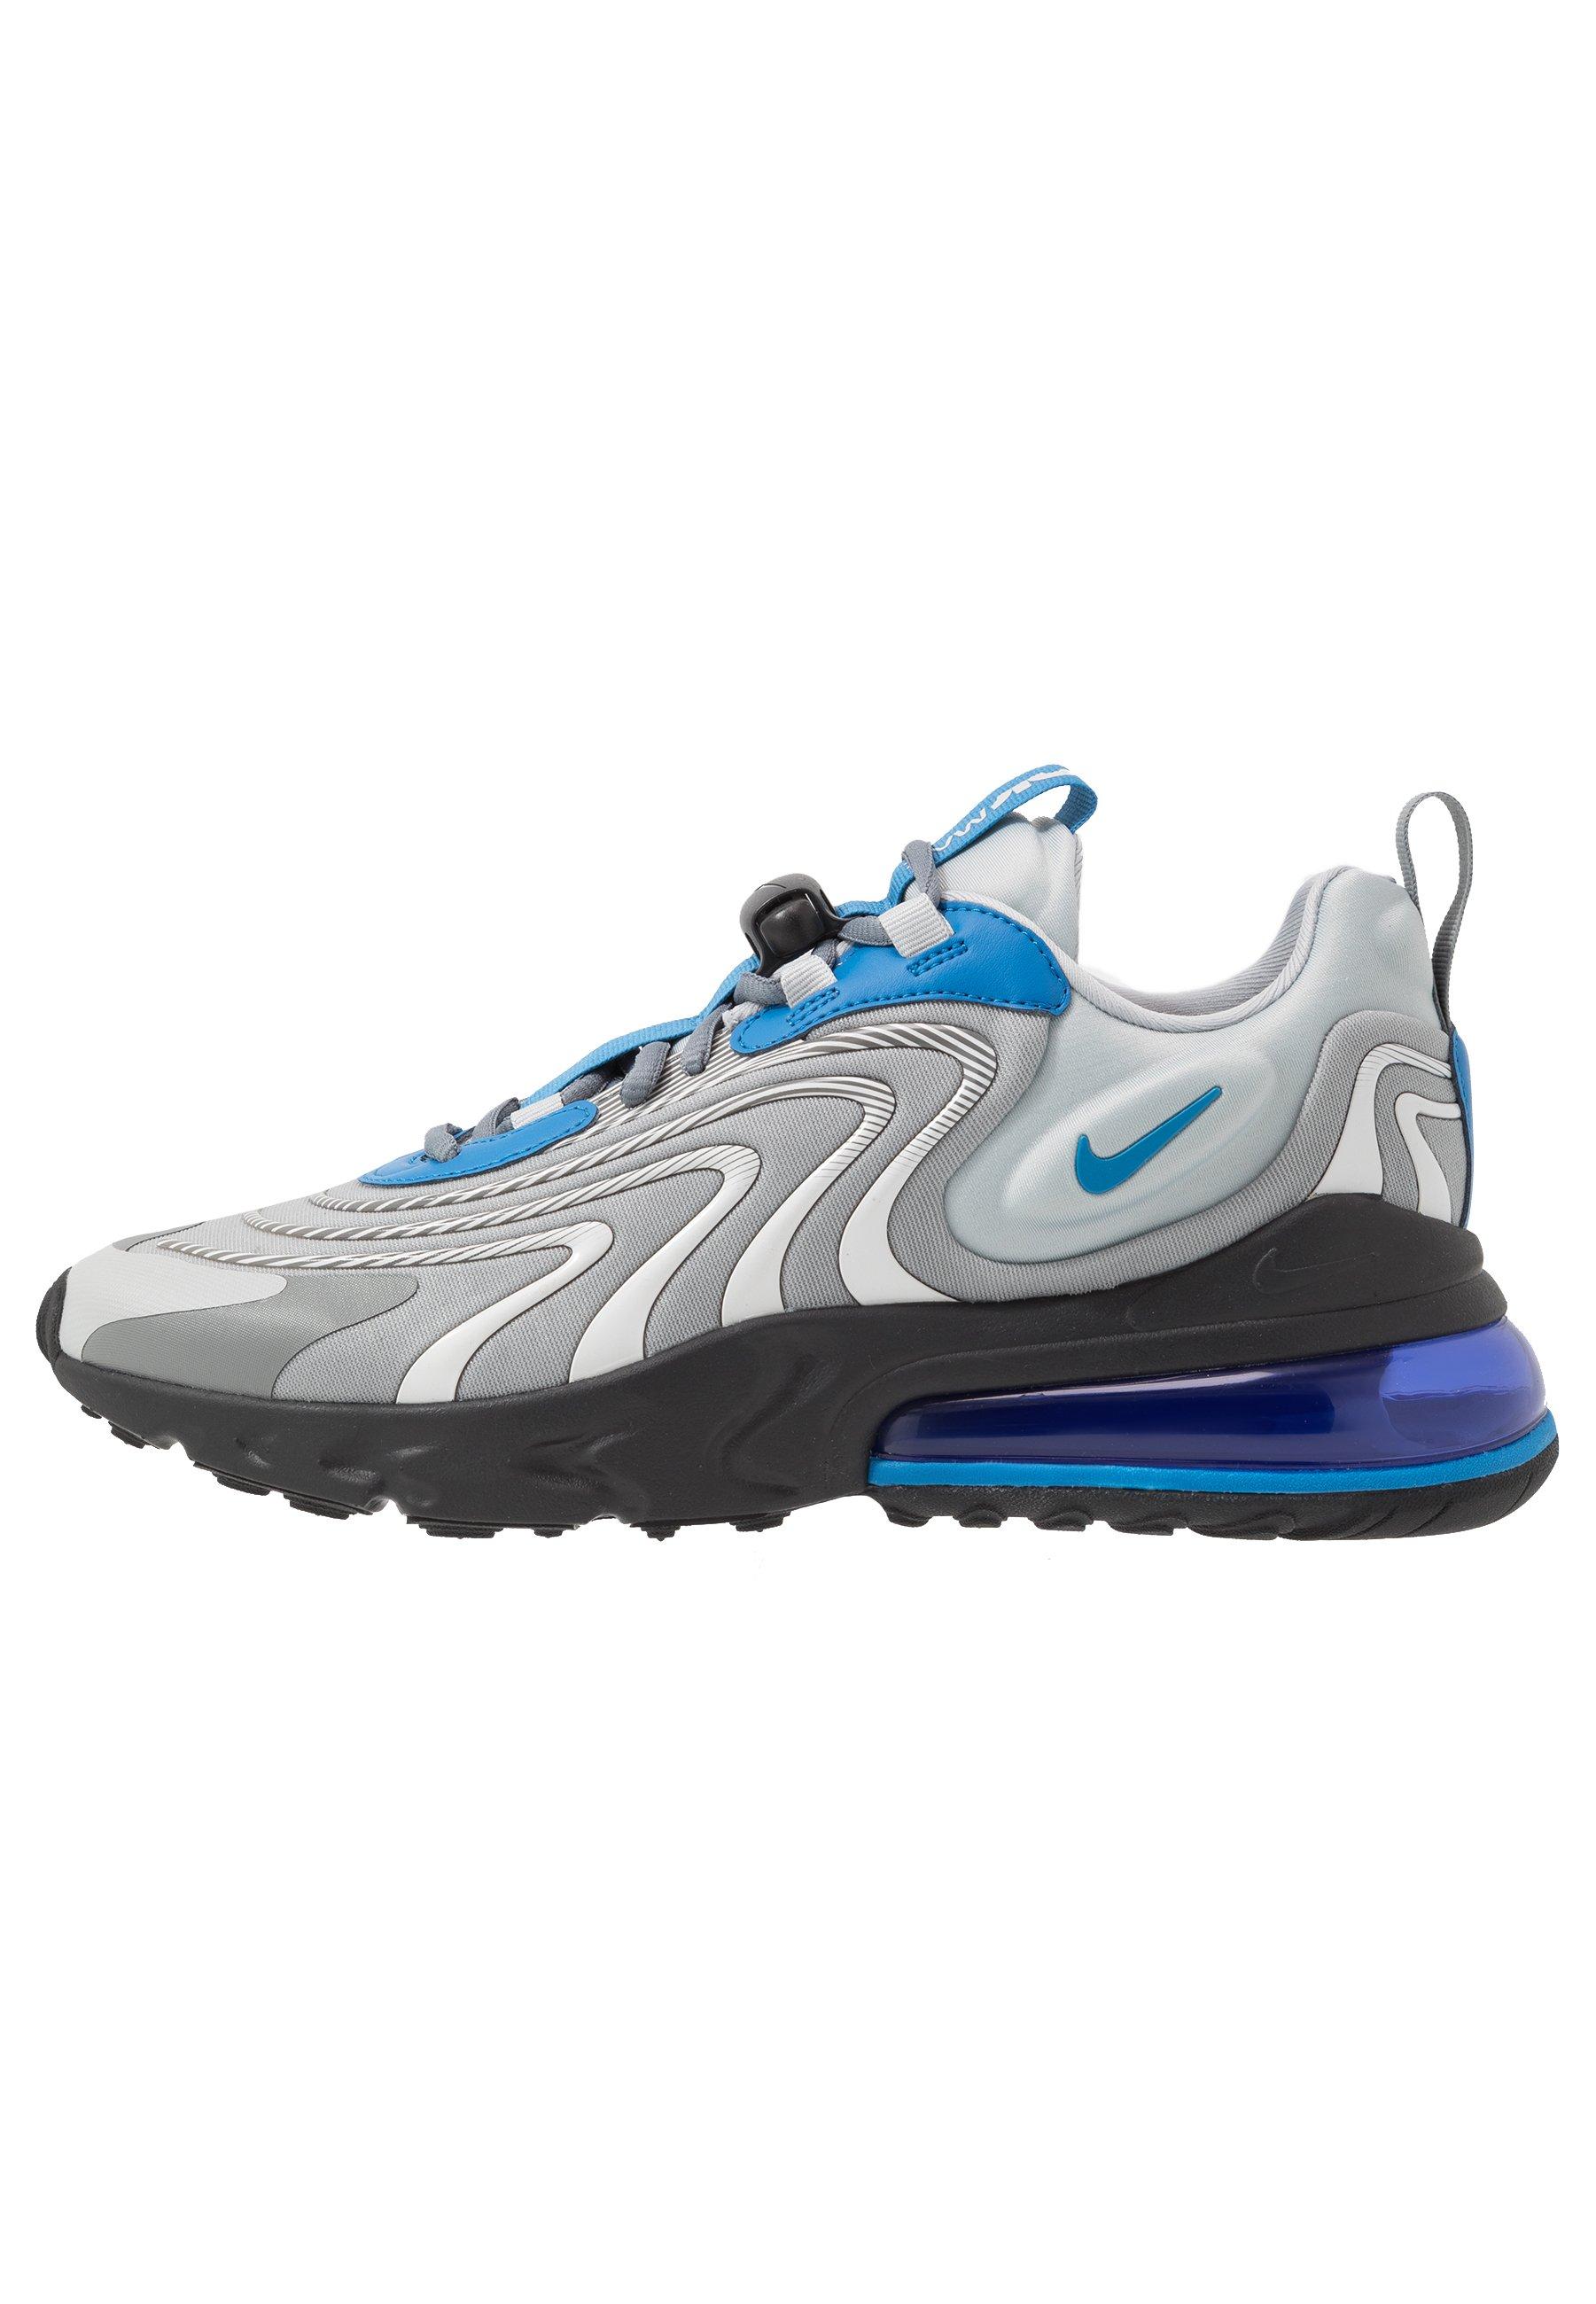 AIR MAX 270 REACT ENG Sneakers light smoke greybattle bluesmoke greyblackhyper bluewhite